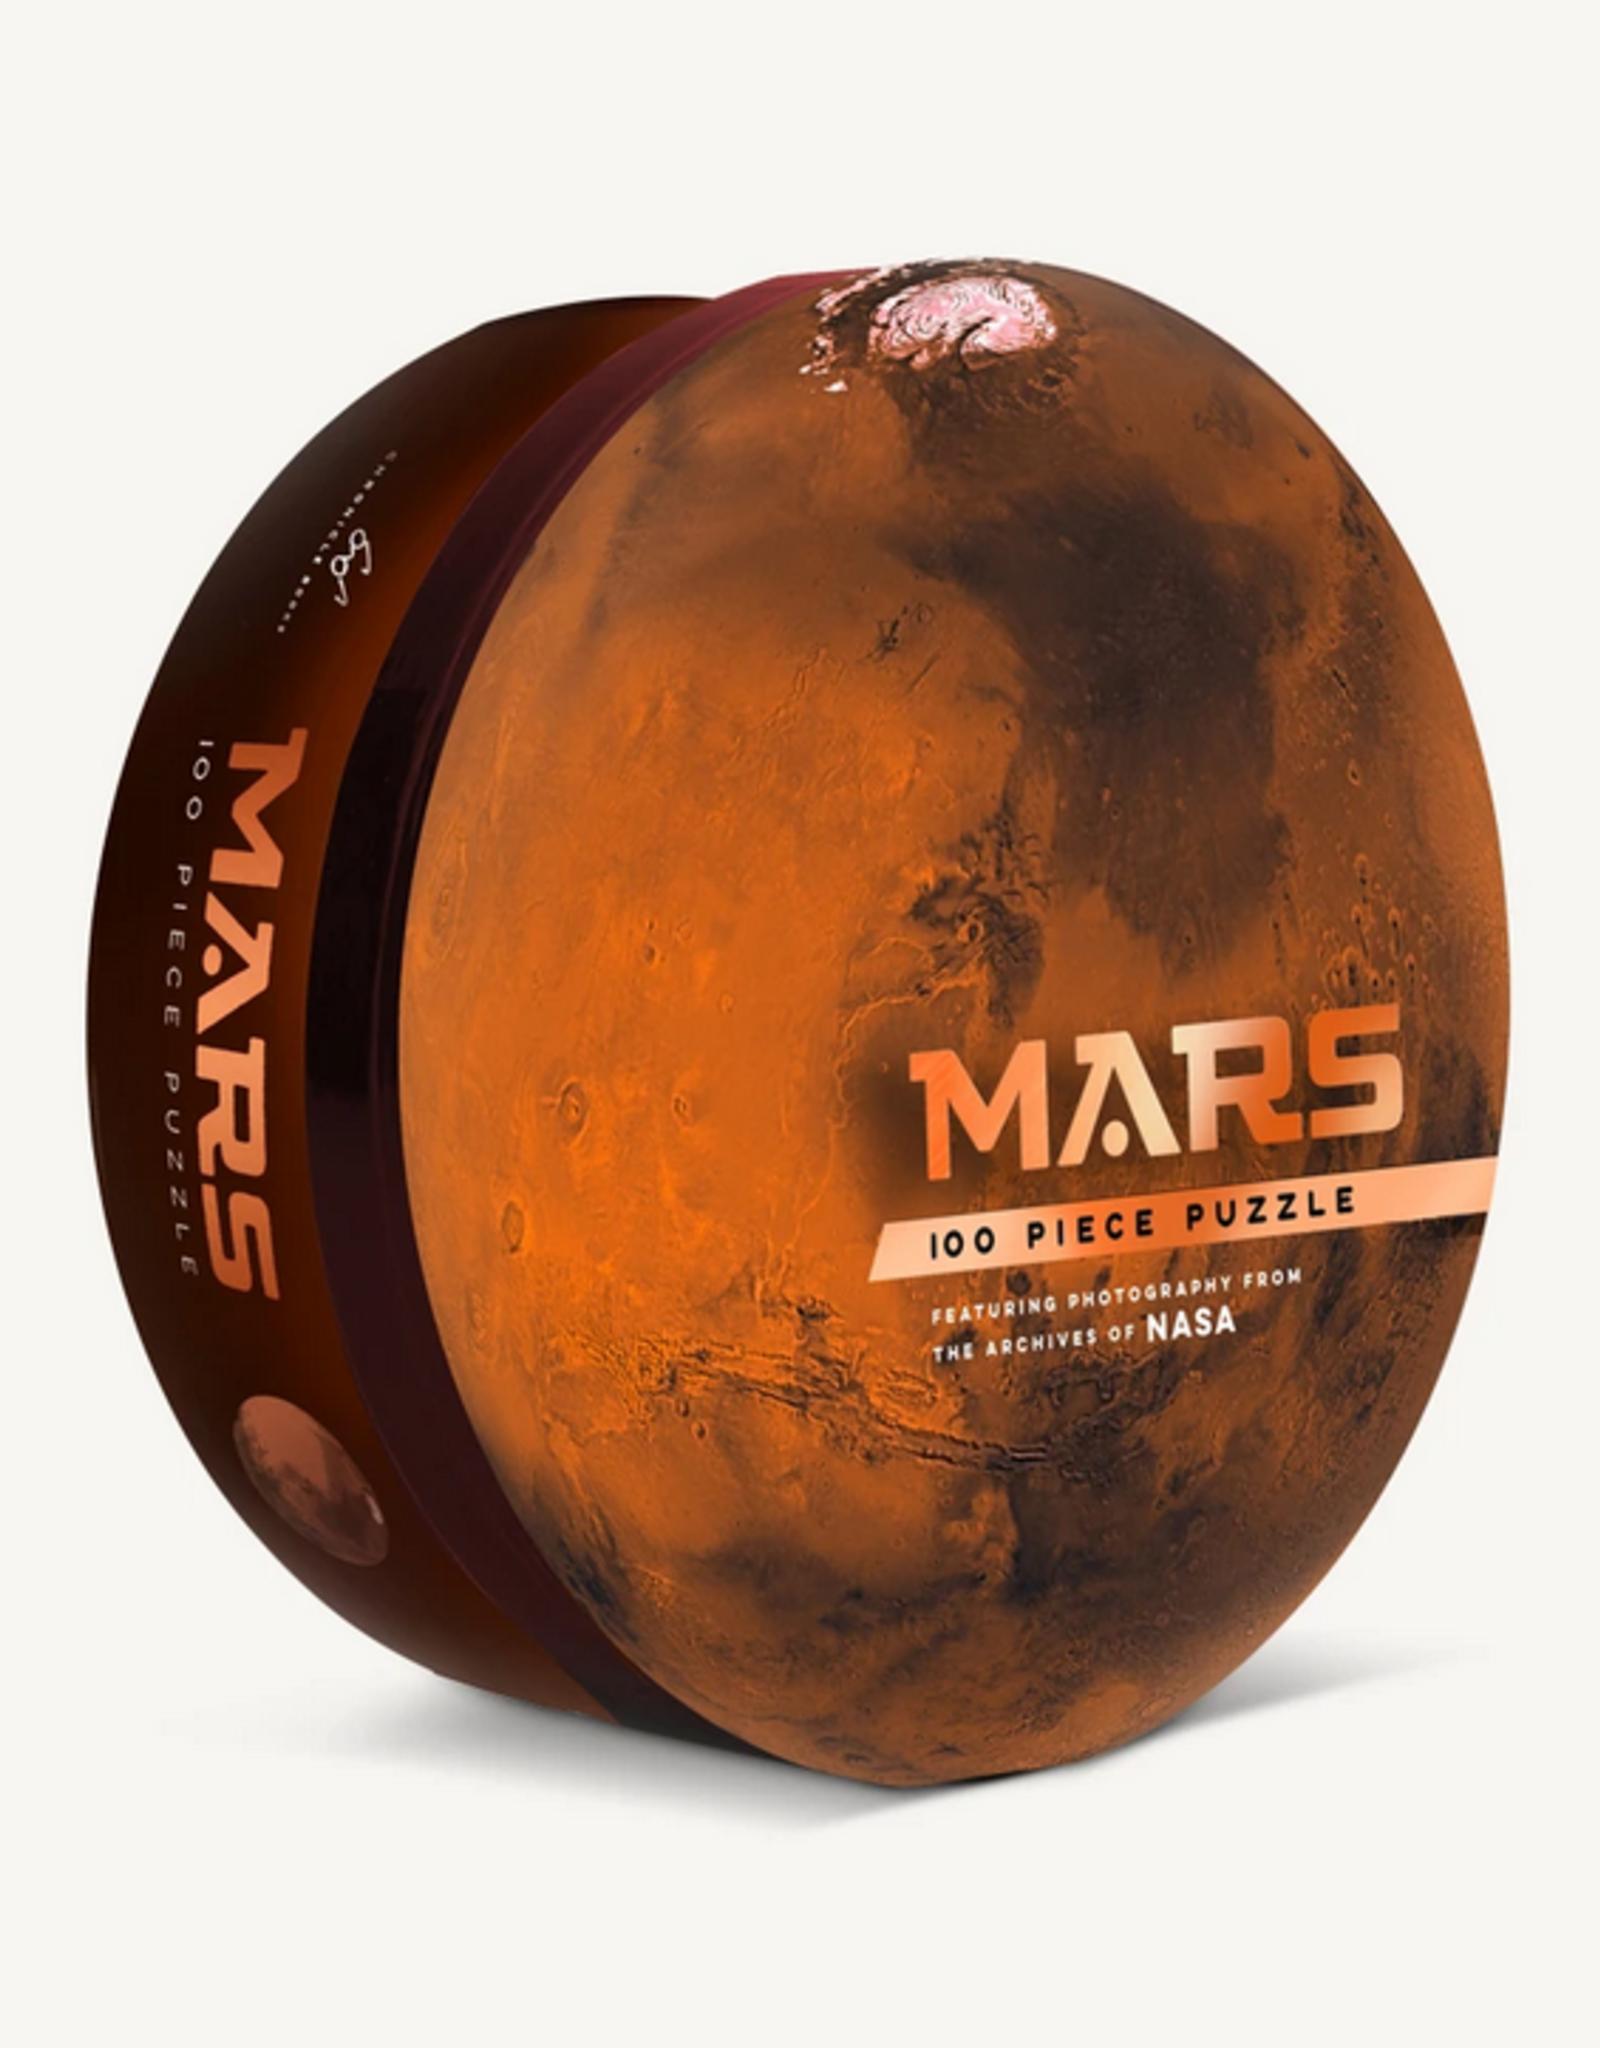 Mars : 100 Piece Puzzle